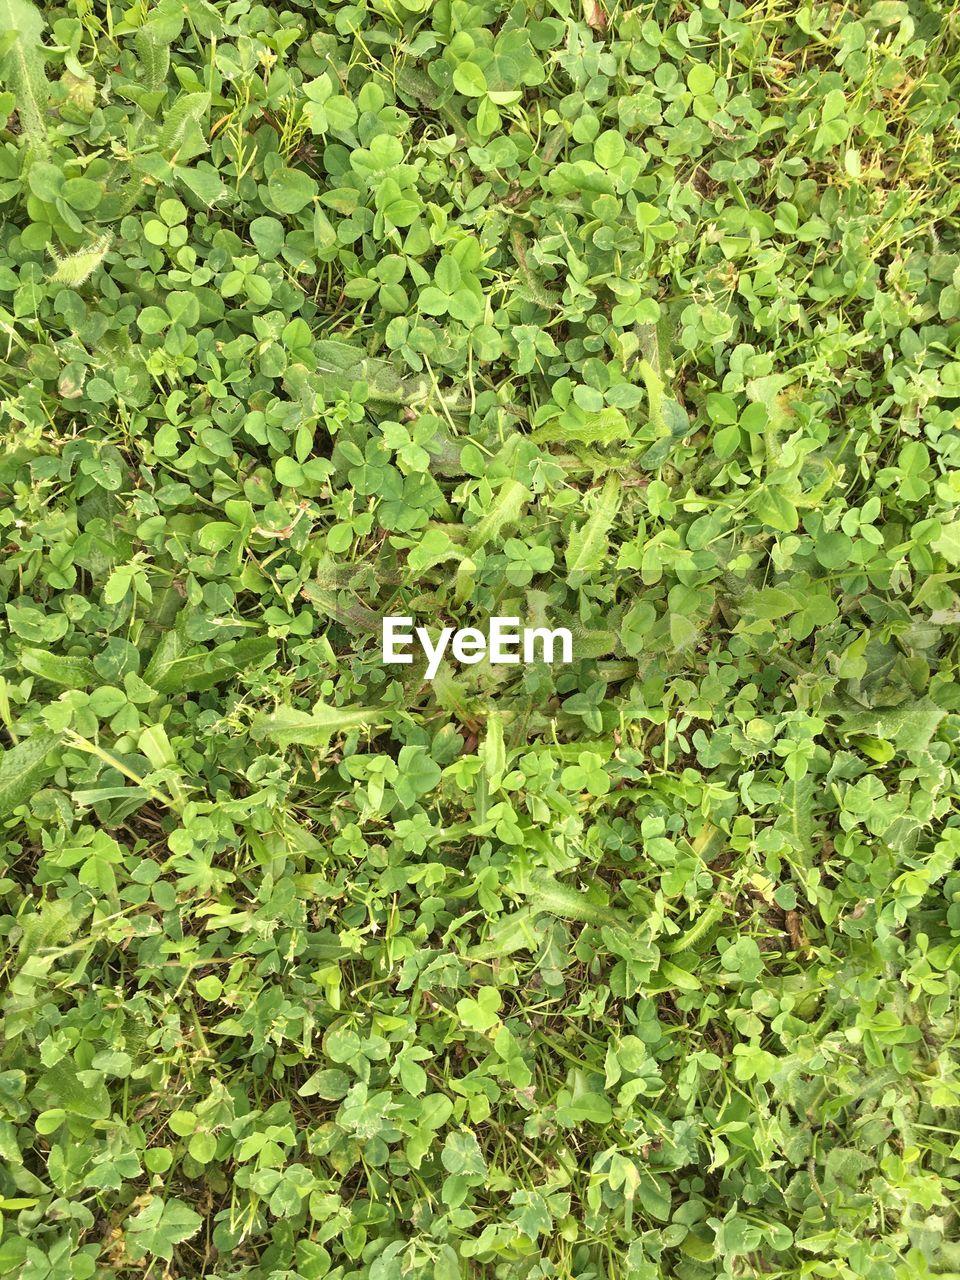 leaf, green color, abundance, nature, full frame, day, no people, outdoors, freshness